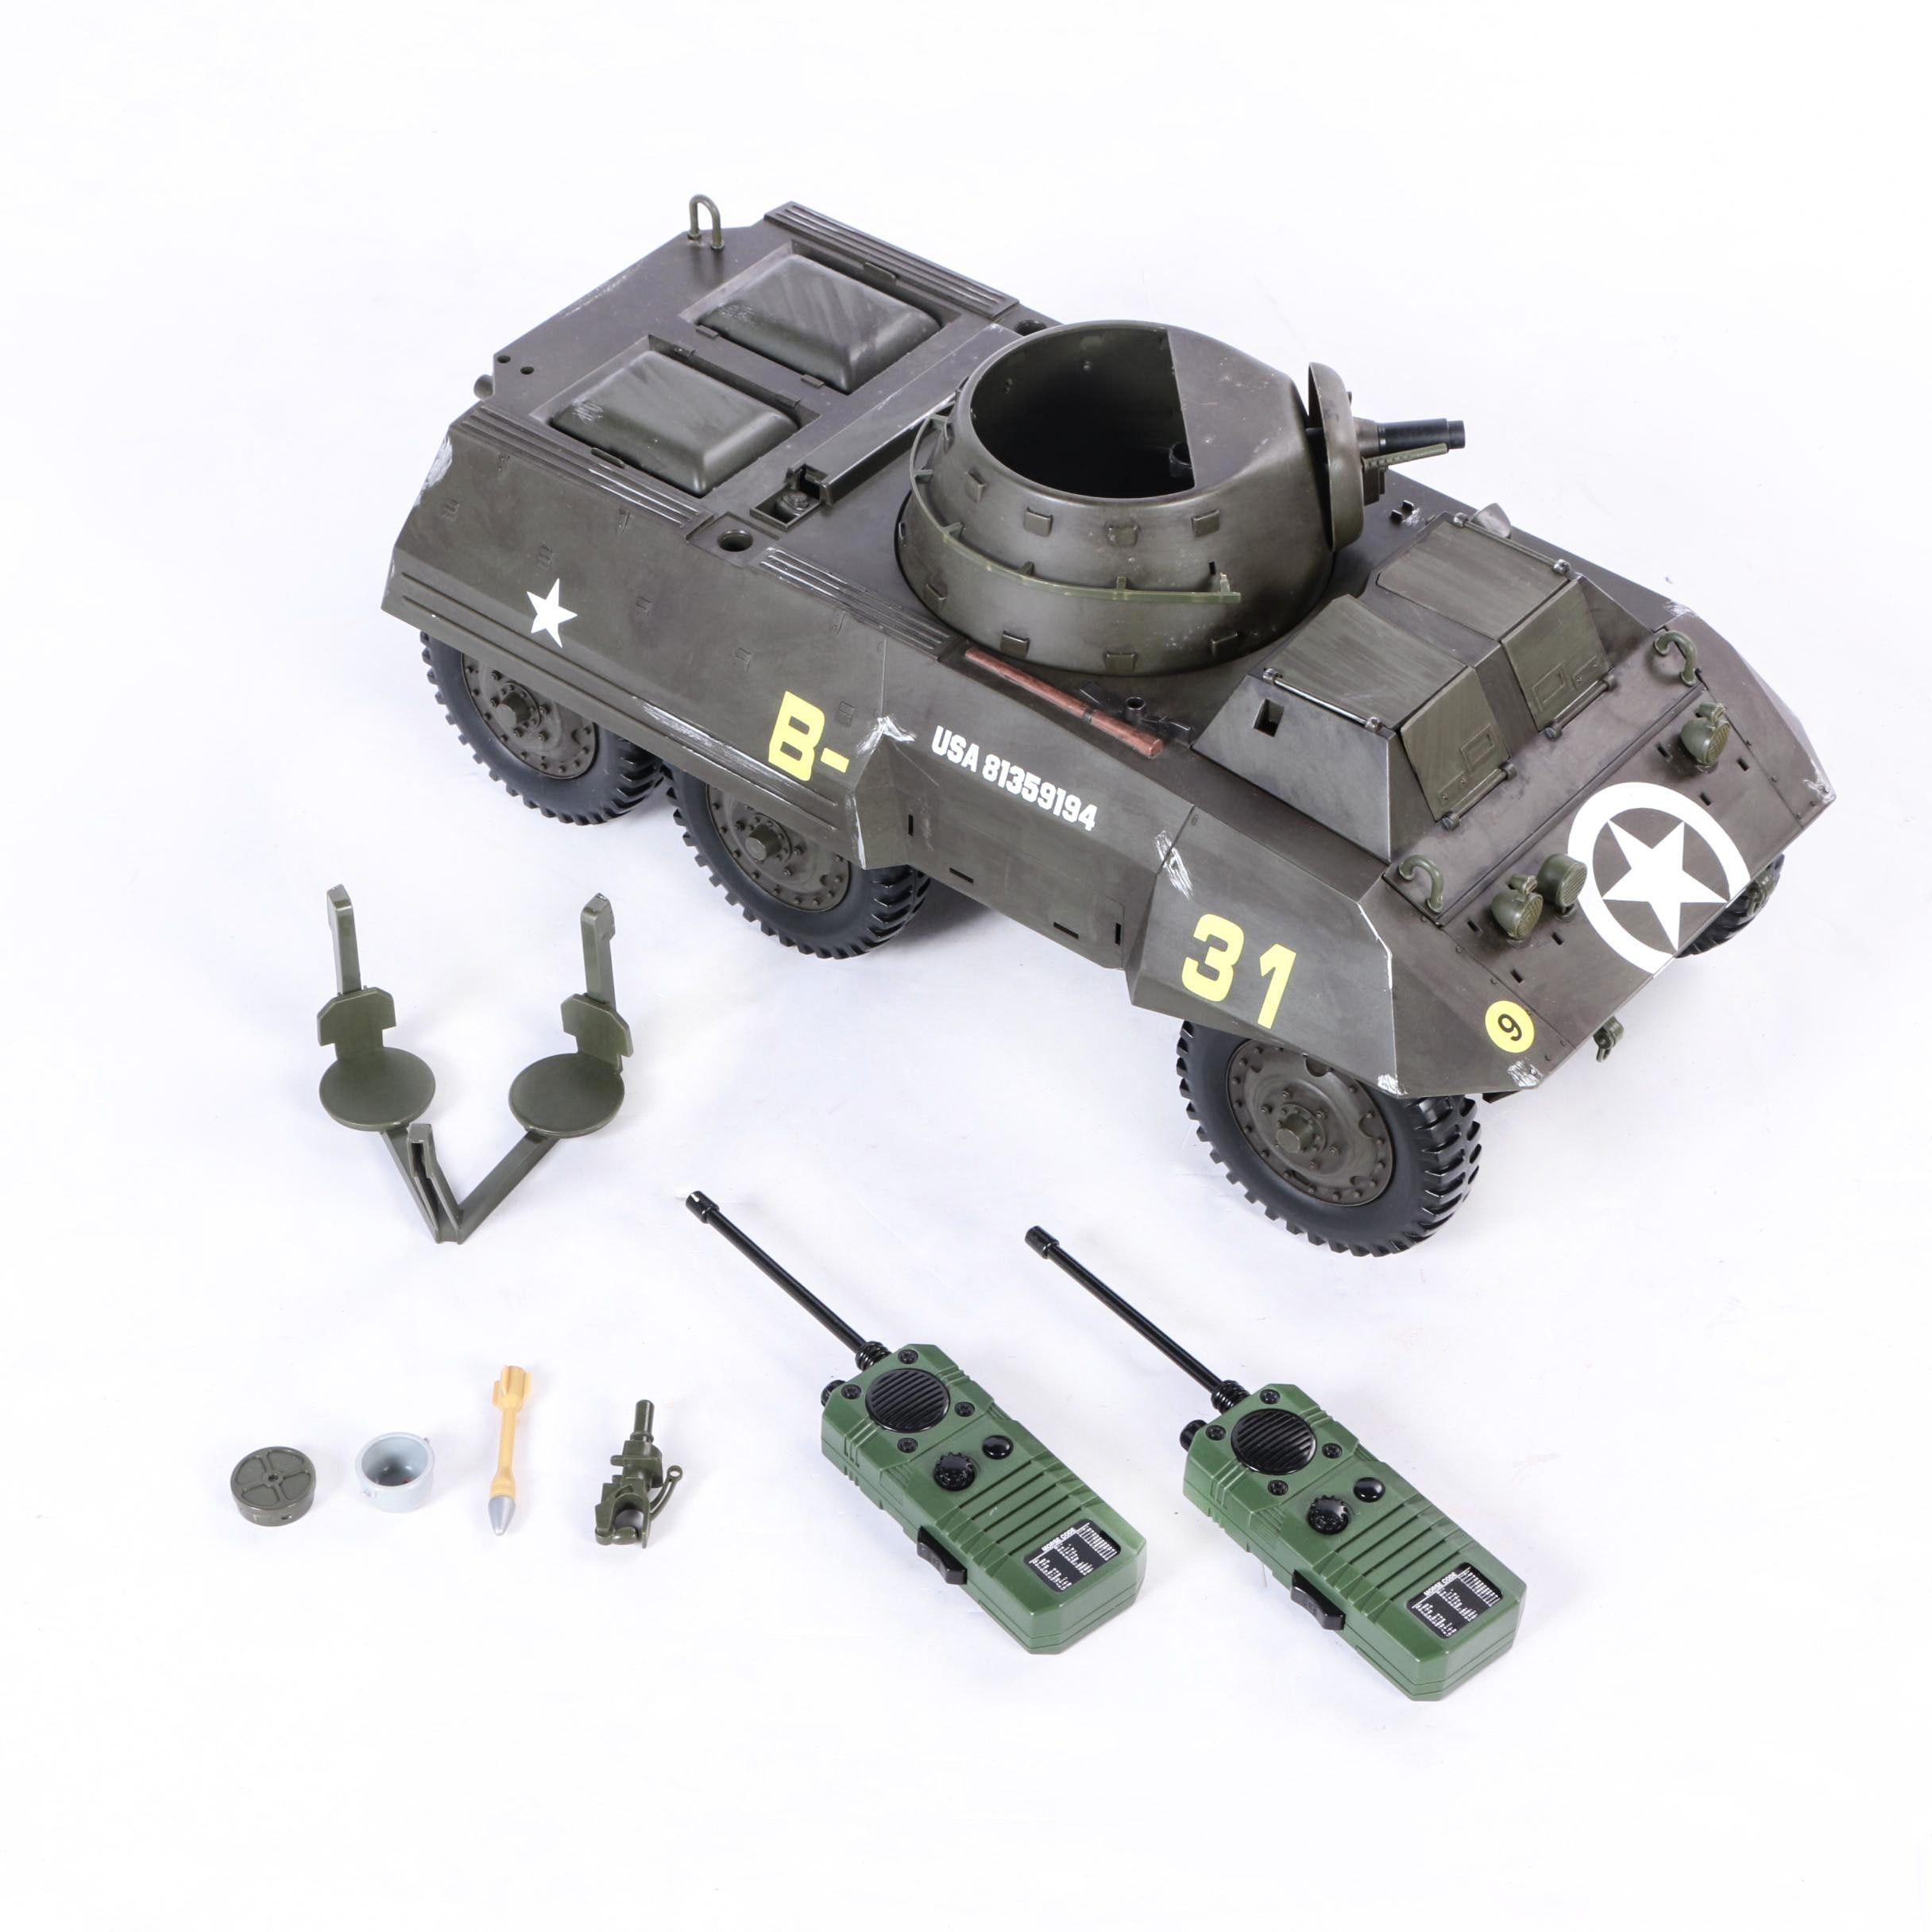 G.I. Joe WWII M8 Light Armored Car and Walkie Talkies